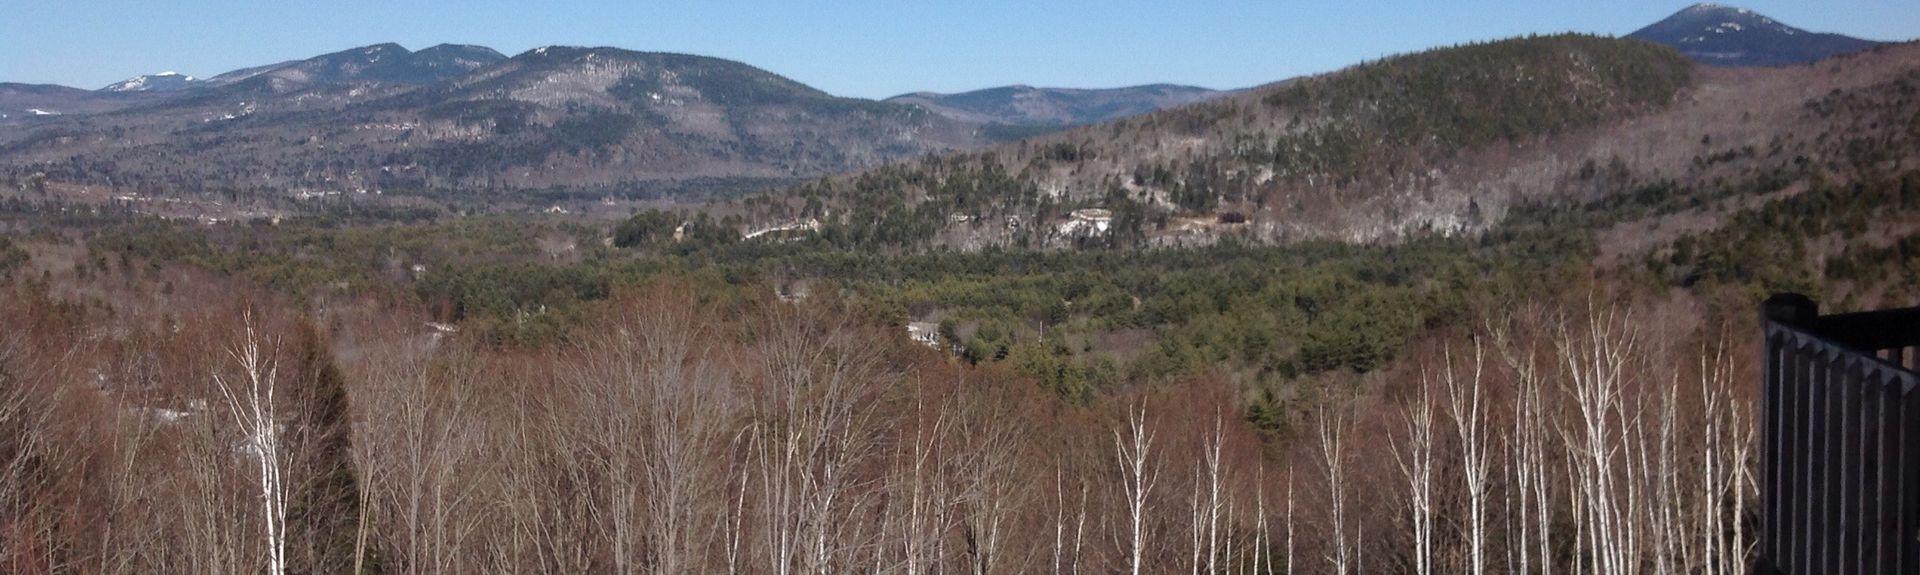 Mountainside at Attitash, Bartlett, NH, USA